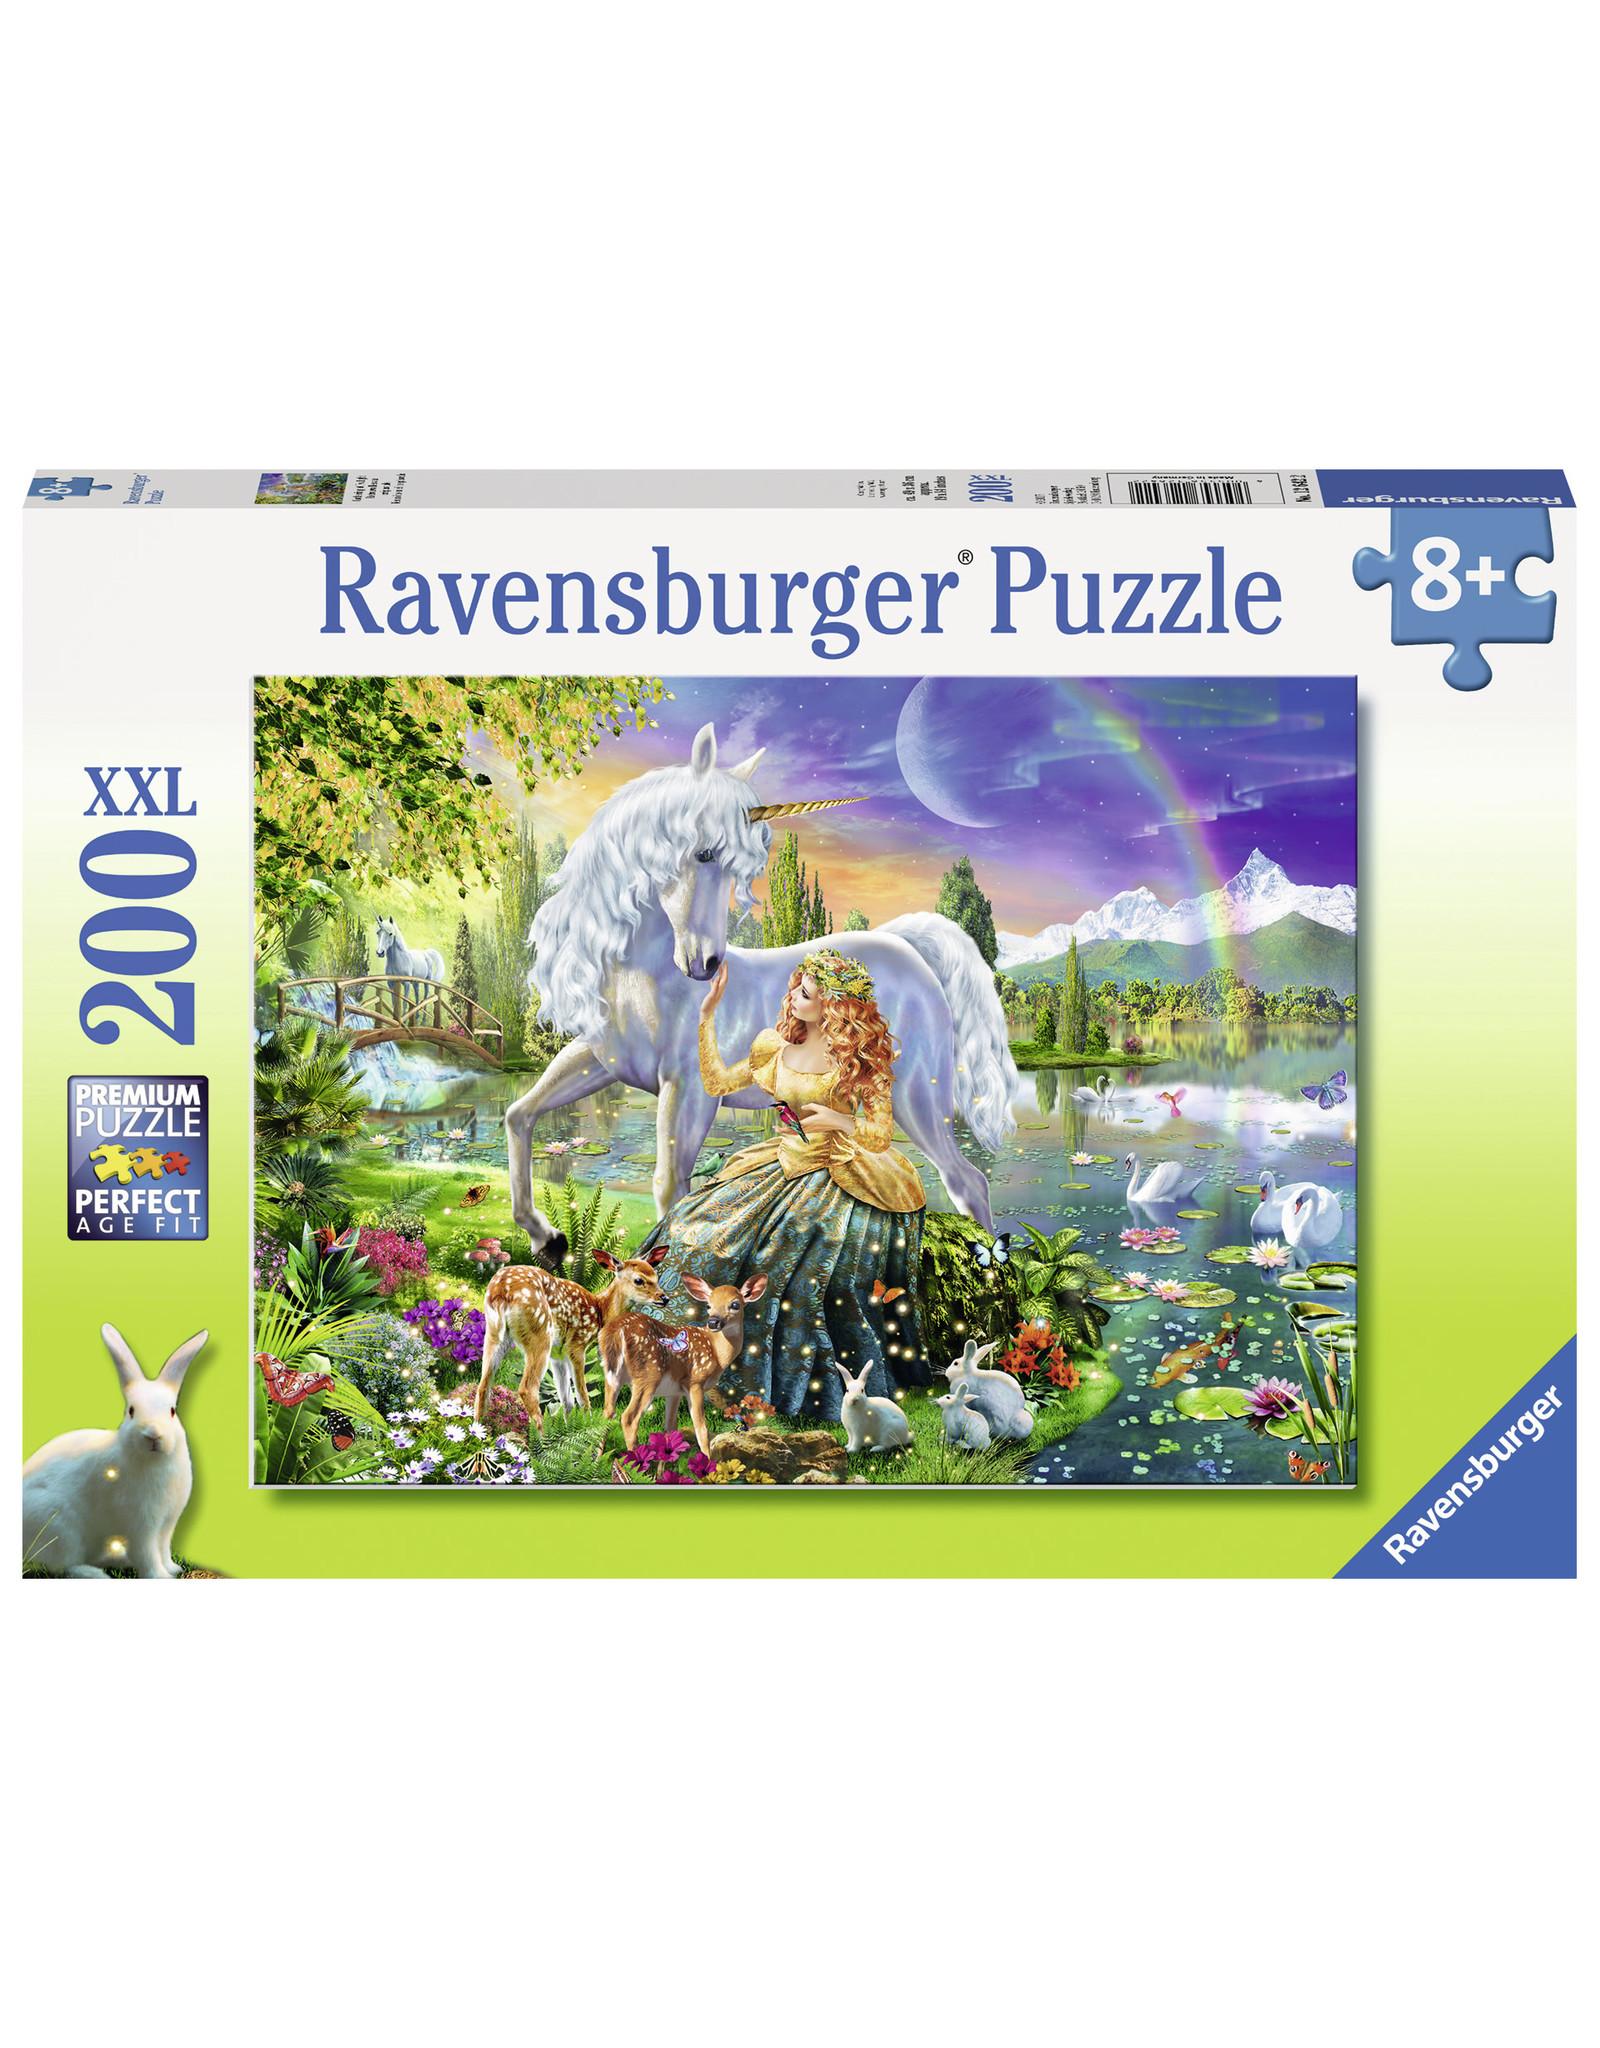 Ravensburger 200 PC TWILIGHT